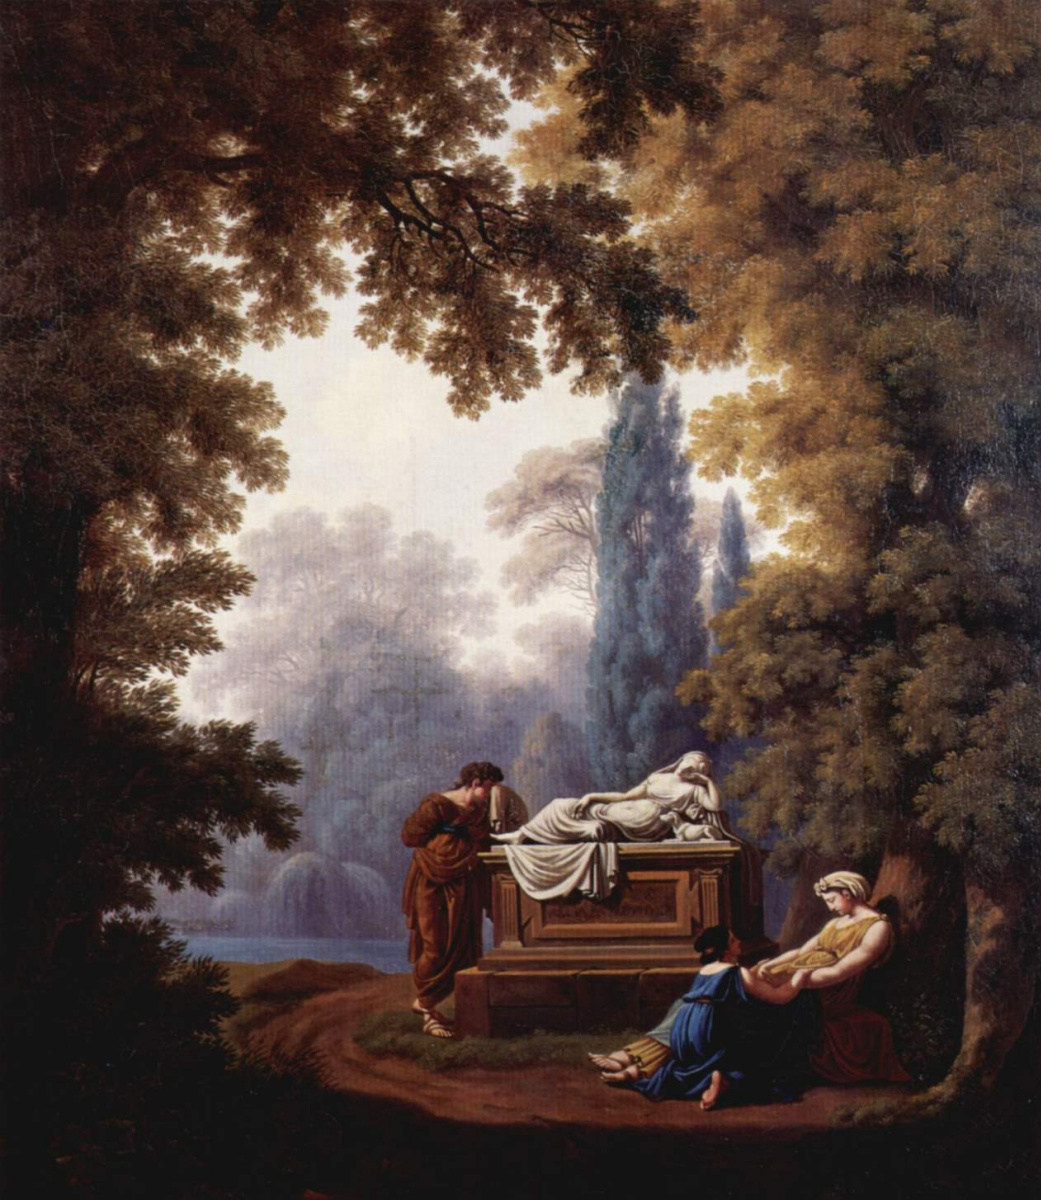 Пьер-Луис де Ларив. Надгробие С. де ла Рив